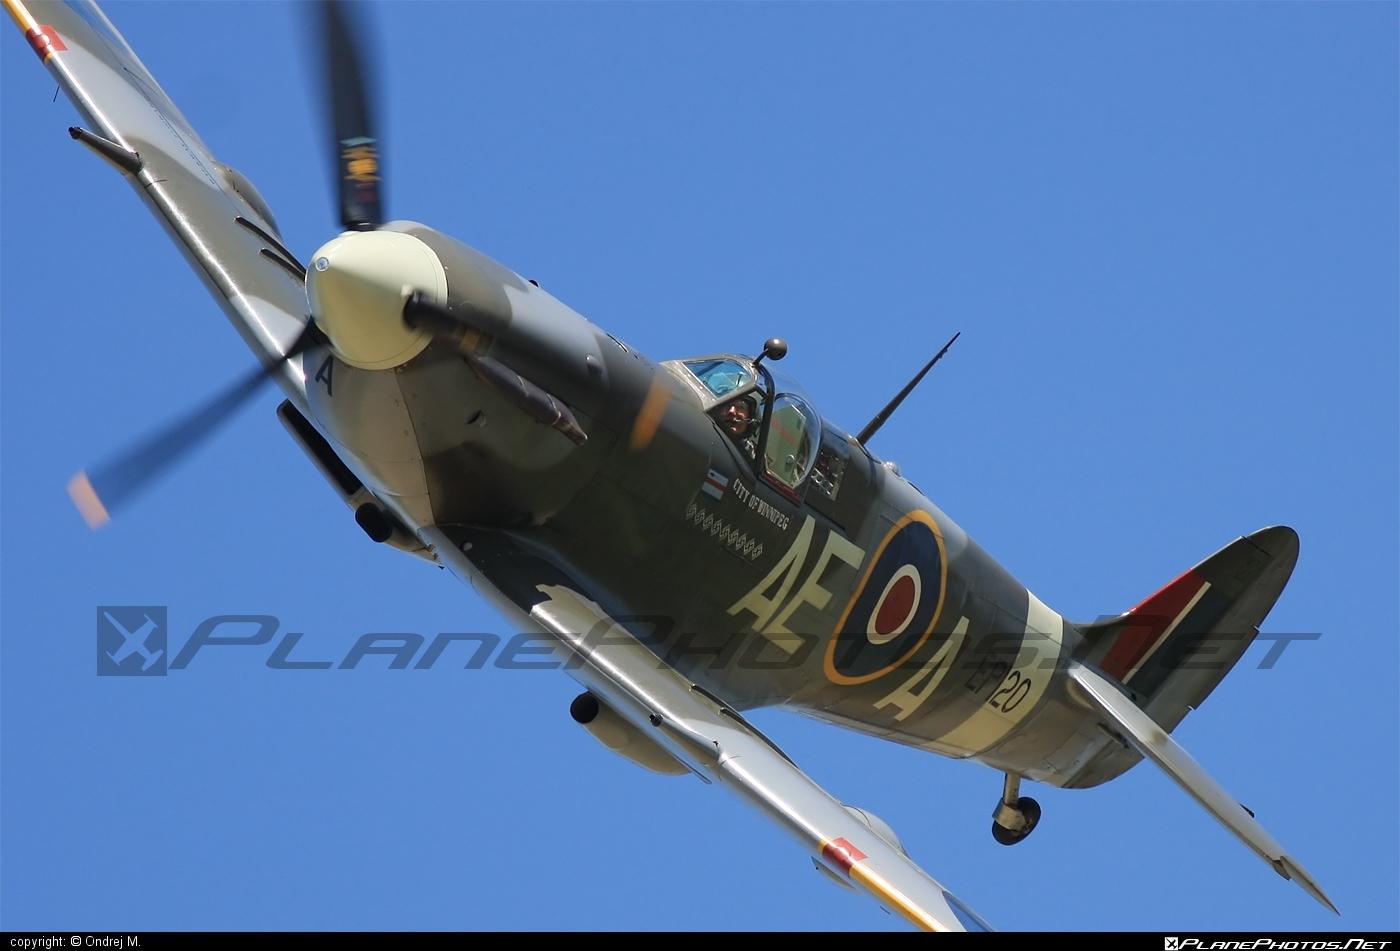 Supermarine Spitfire LF Mk.Vb - G-LFVB operated by Private operator #spitfire #spitfirelfmkvb #supermarine